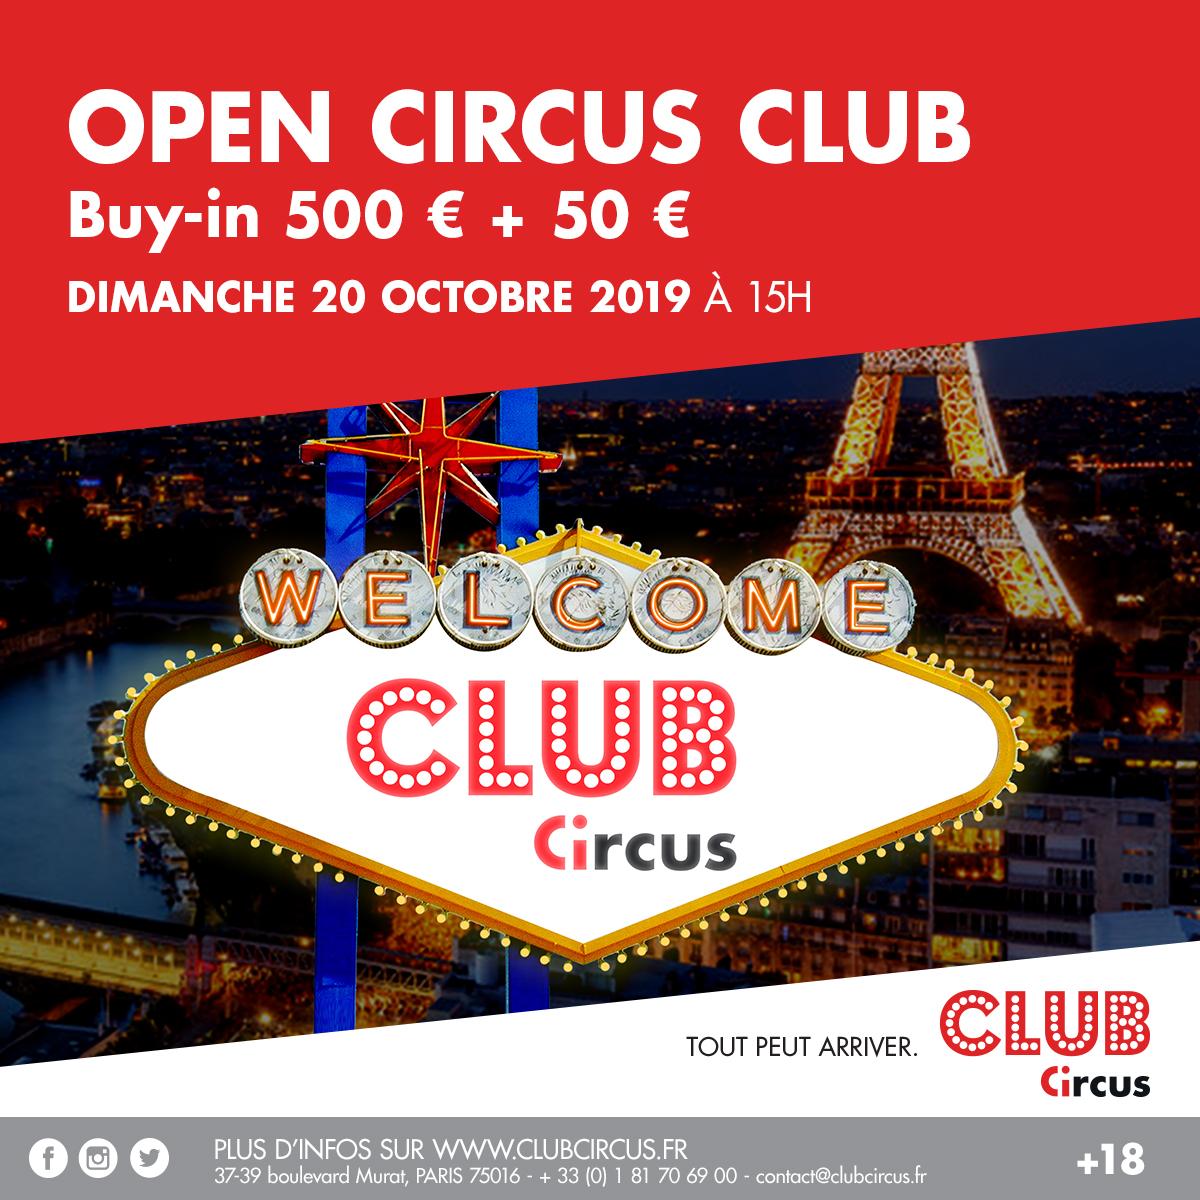 OPEN CIRCUS CLUB